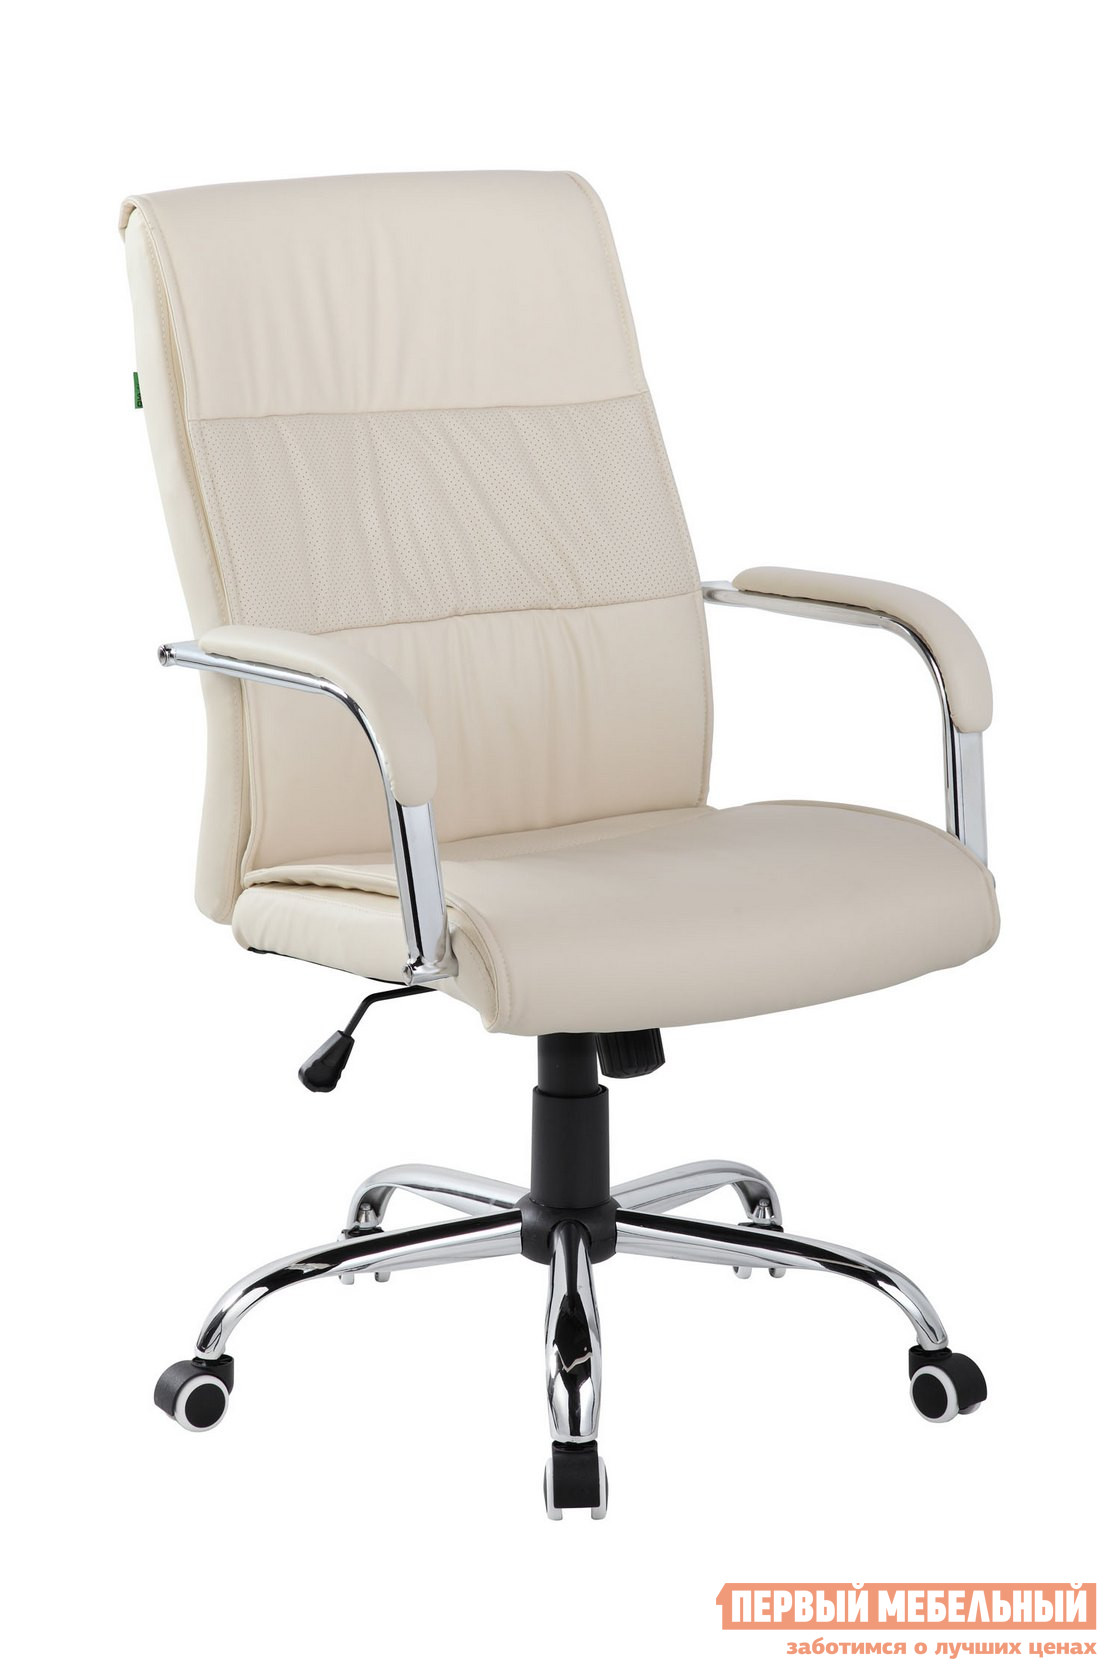 Кресло руководителя Riva Chair Кресло RCH 9249 - 1 Бежевый (QC-09)